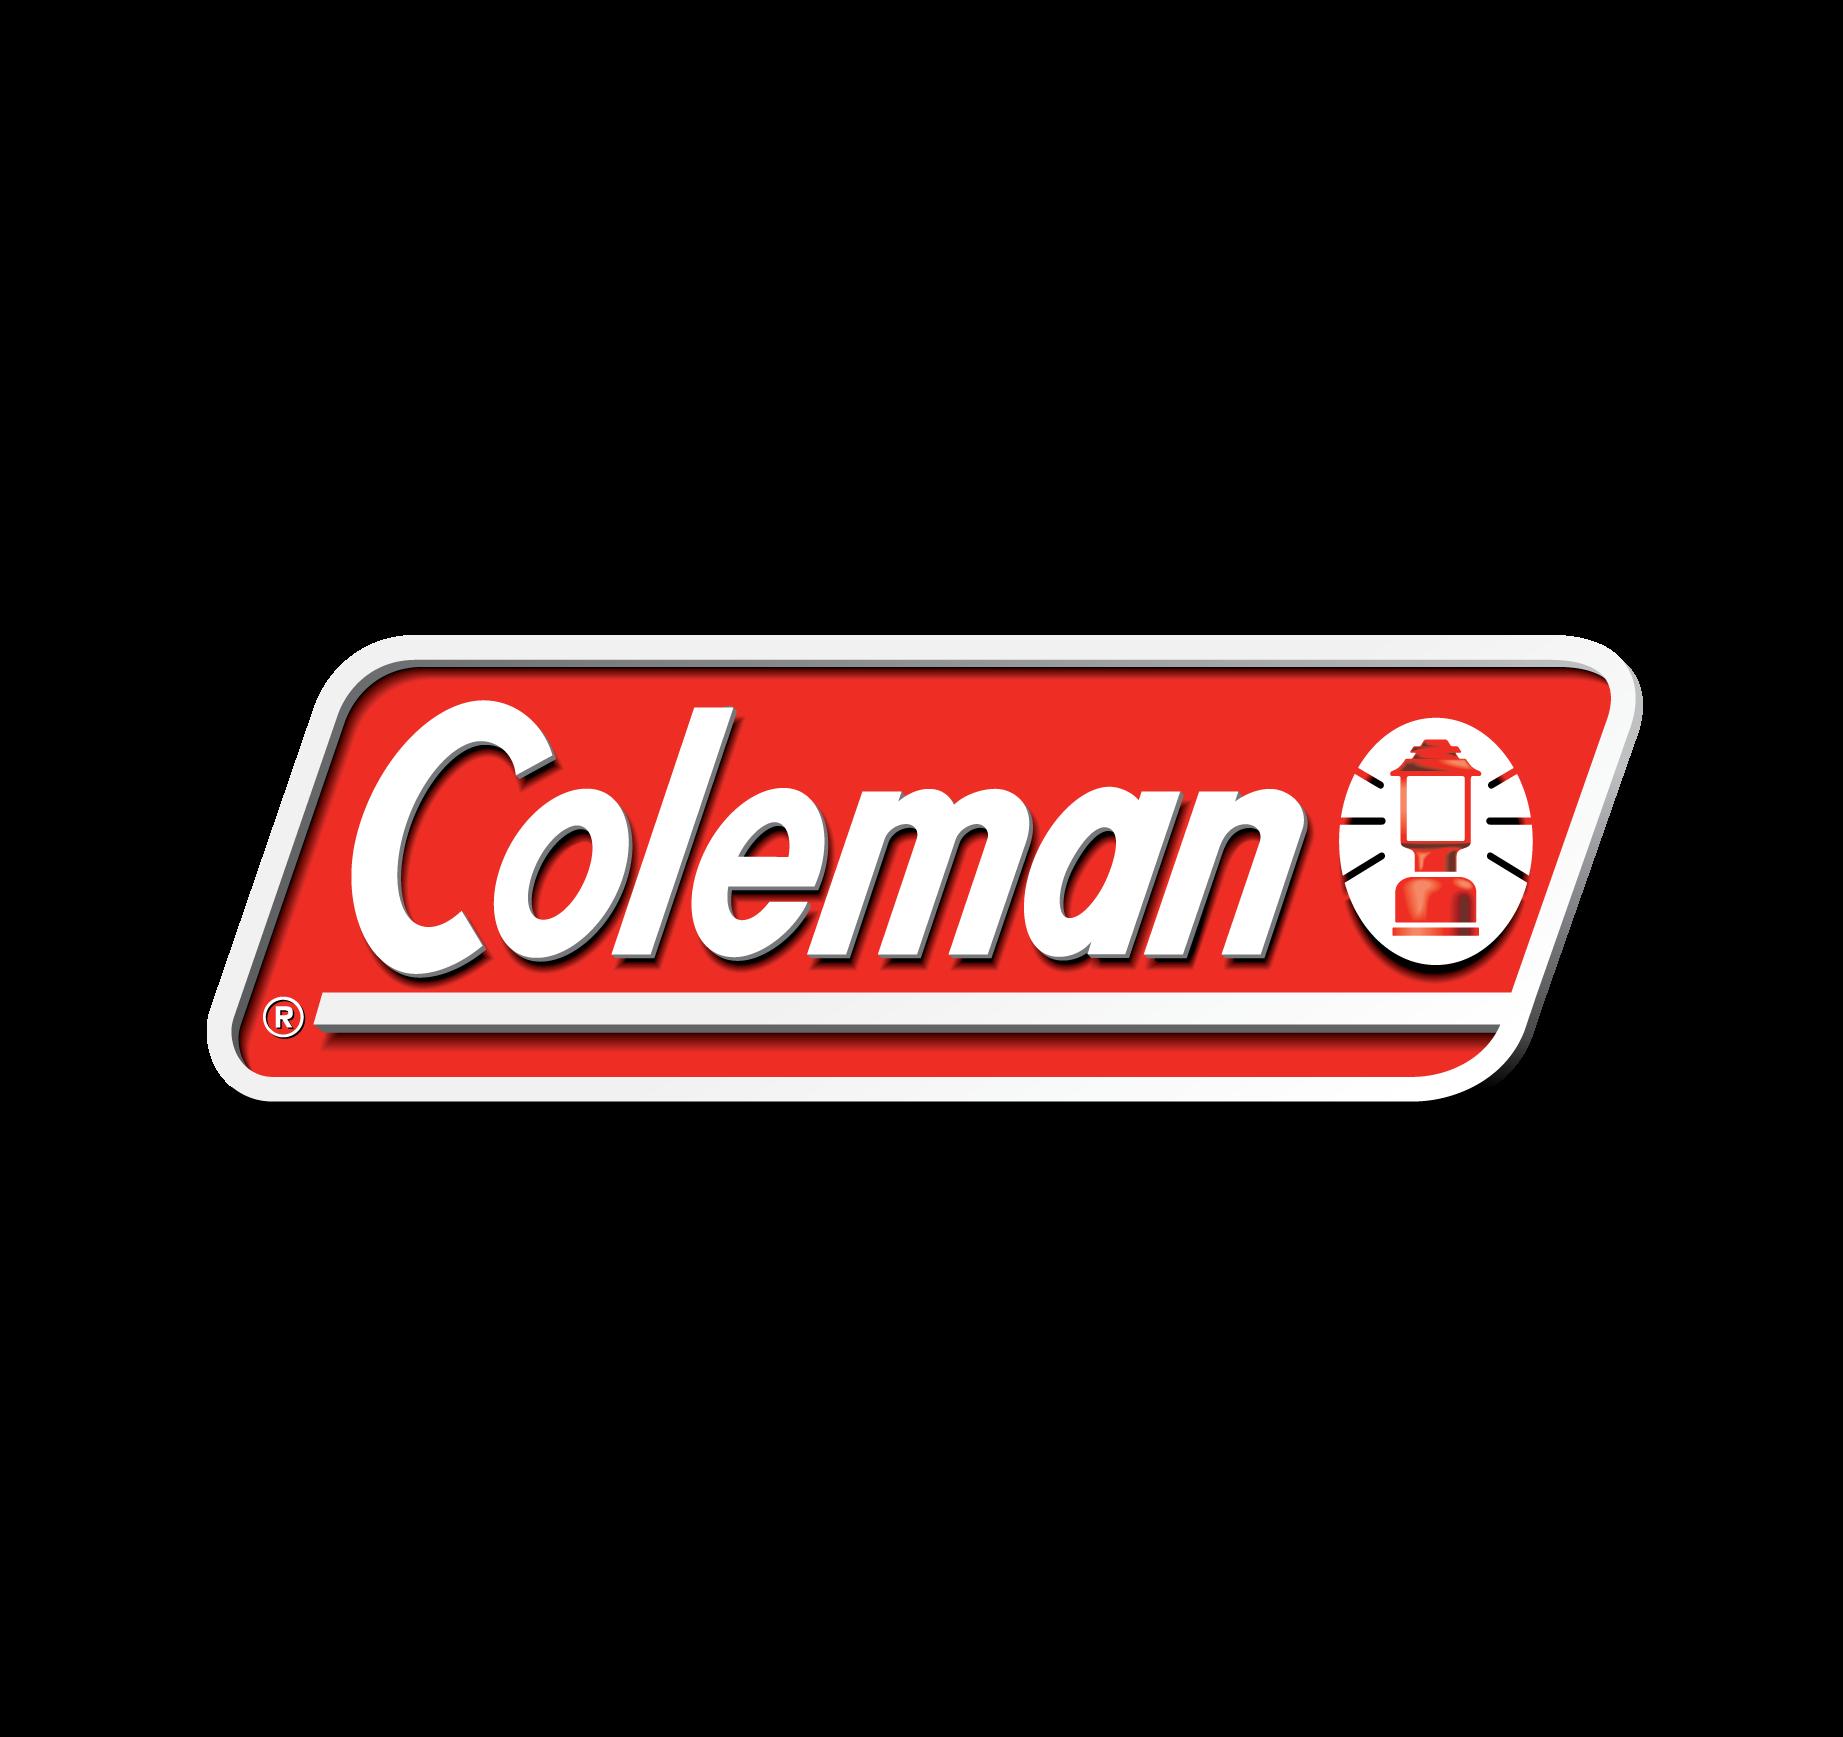 Coleman Lantern LT Travel Trailer Logo